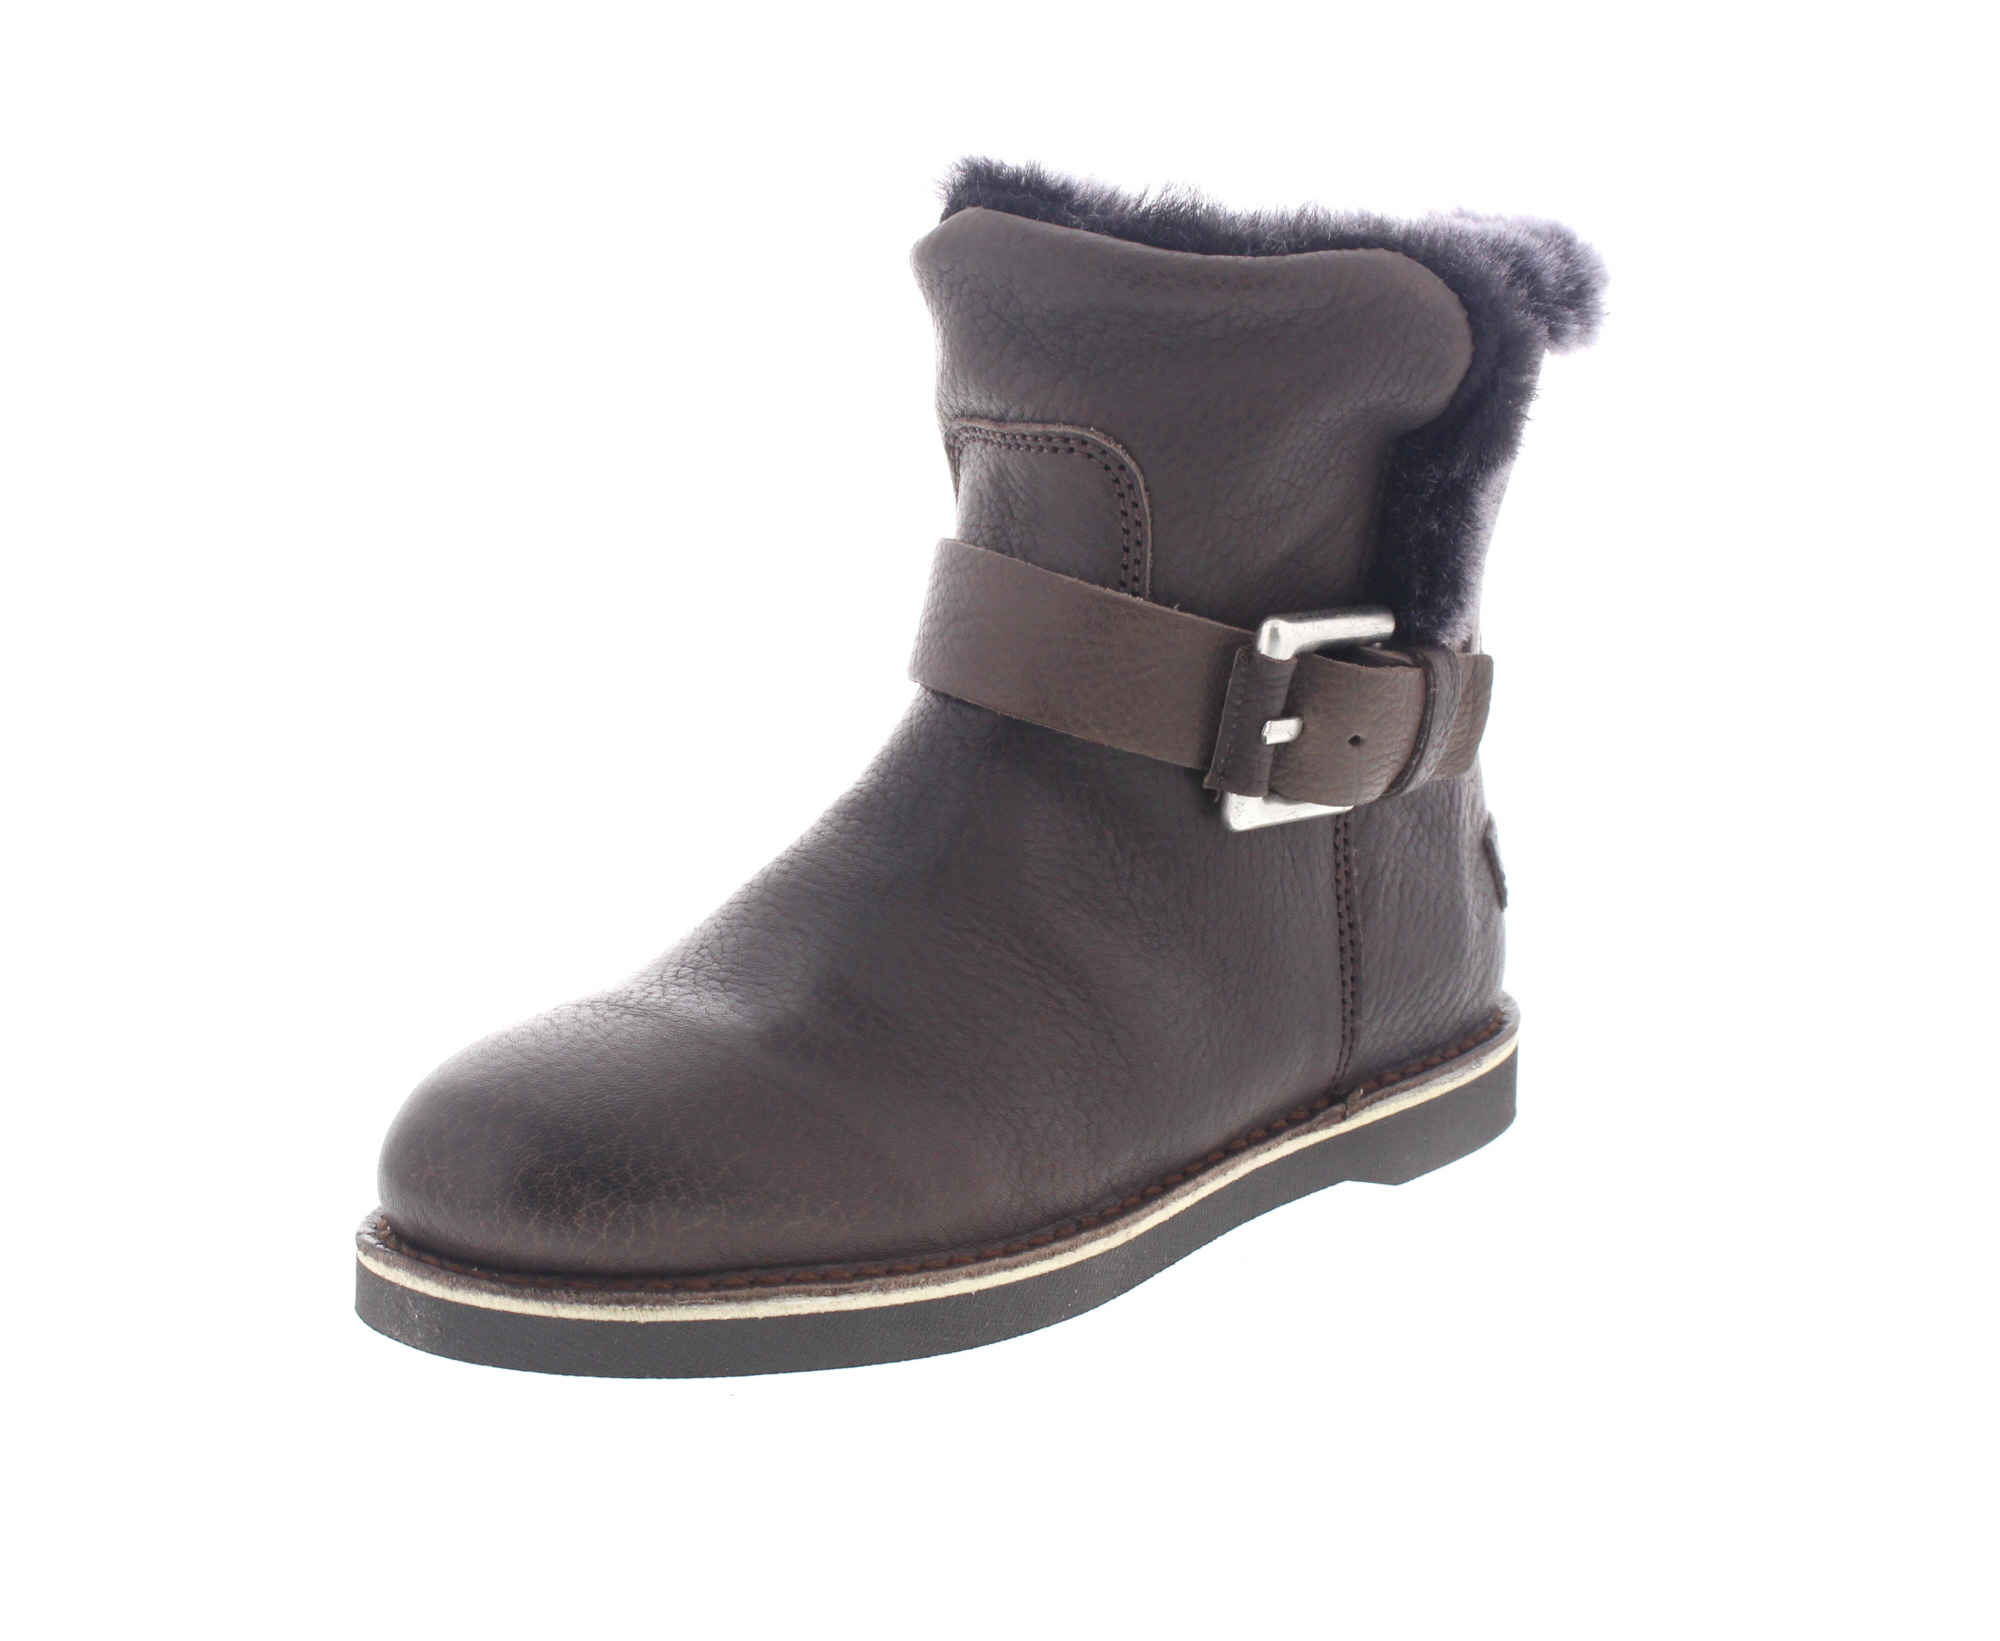 SHABBIES AMSTERDAM Schuhe - Siefeletten 202080 - grey-0